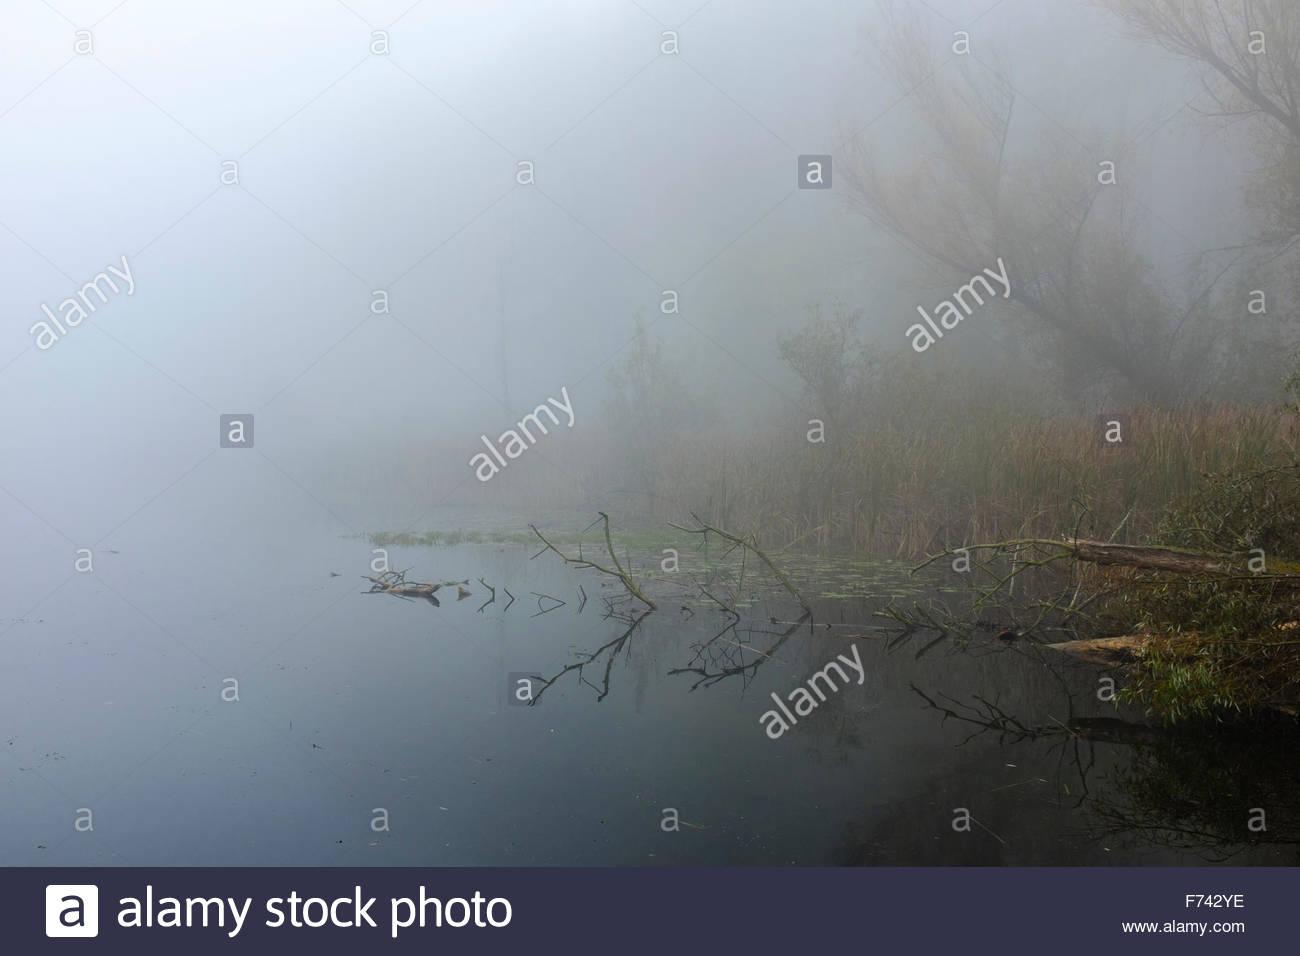 Foggy morning river reflexion. - Stock Image